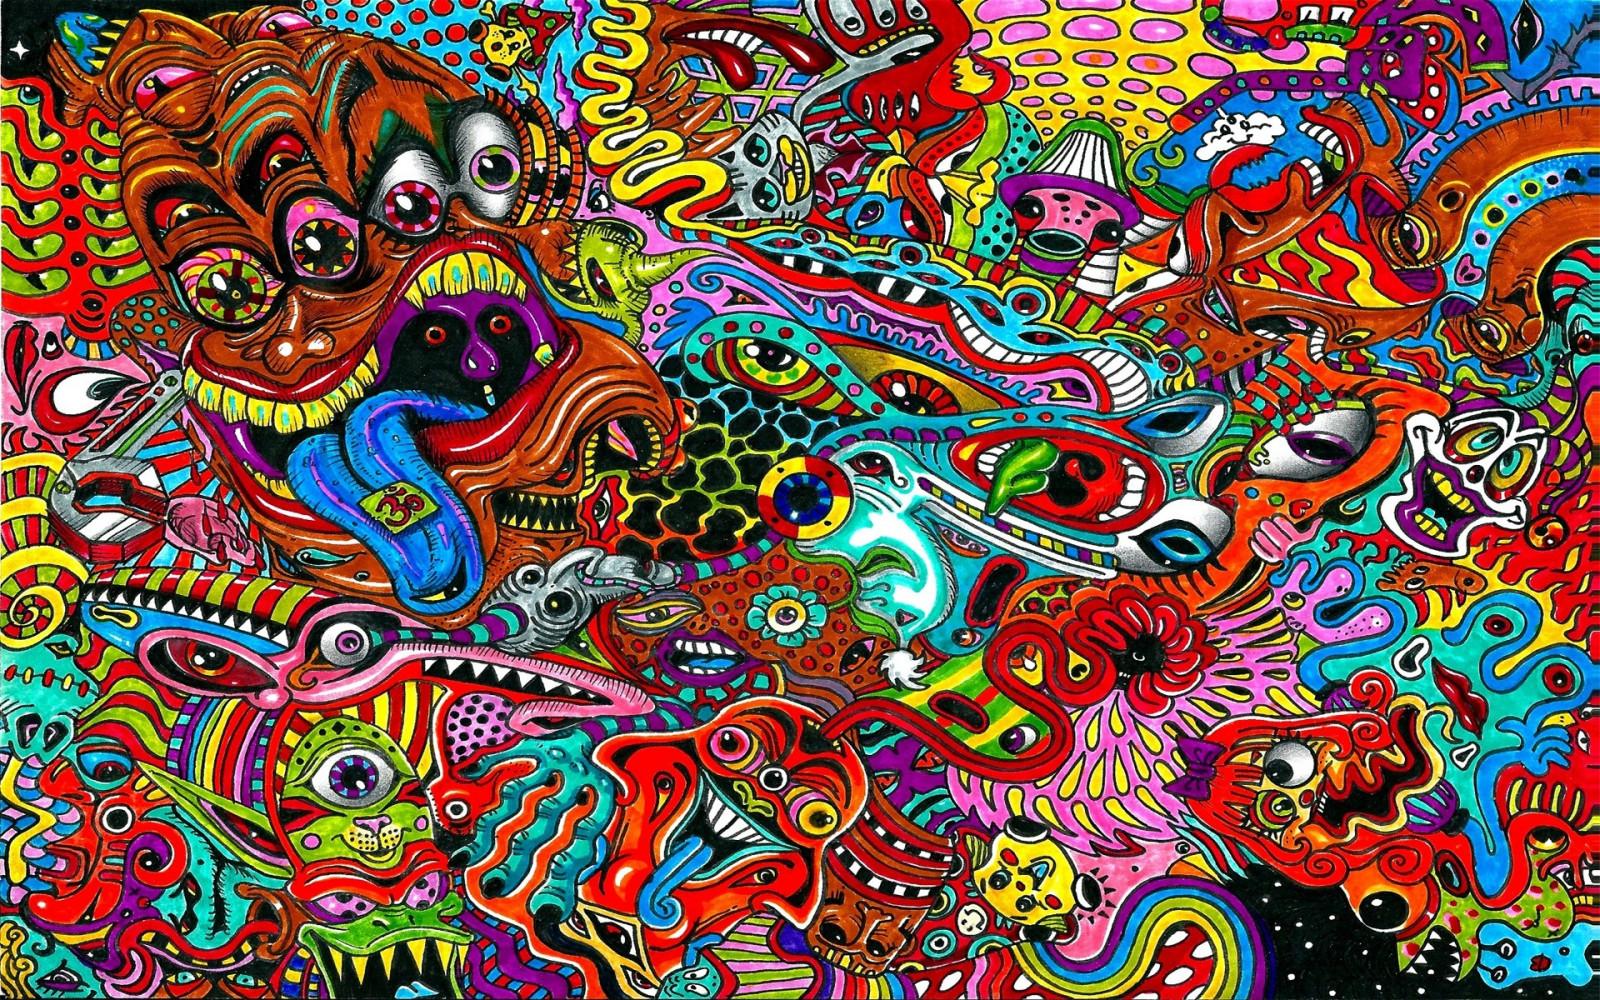 Fond d 39 cran dessin surr aliste color psych d lique - Dessin colore ...